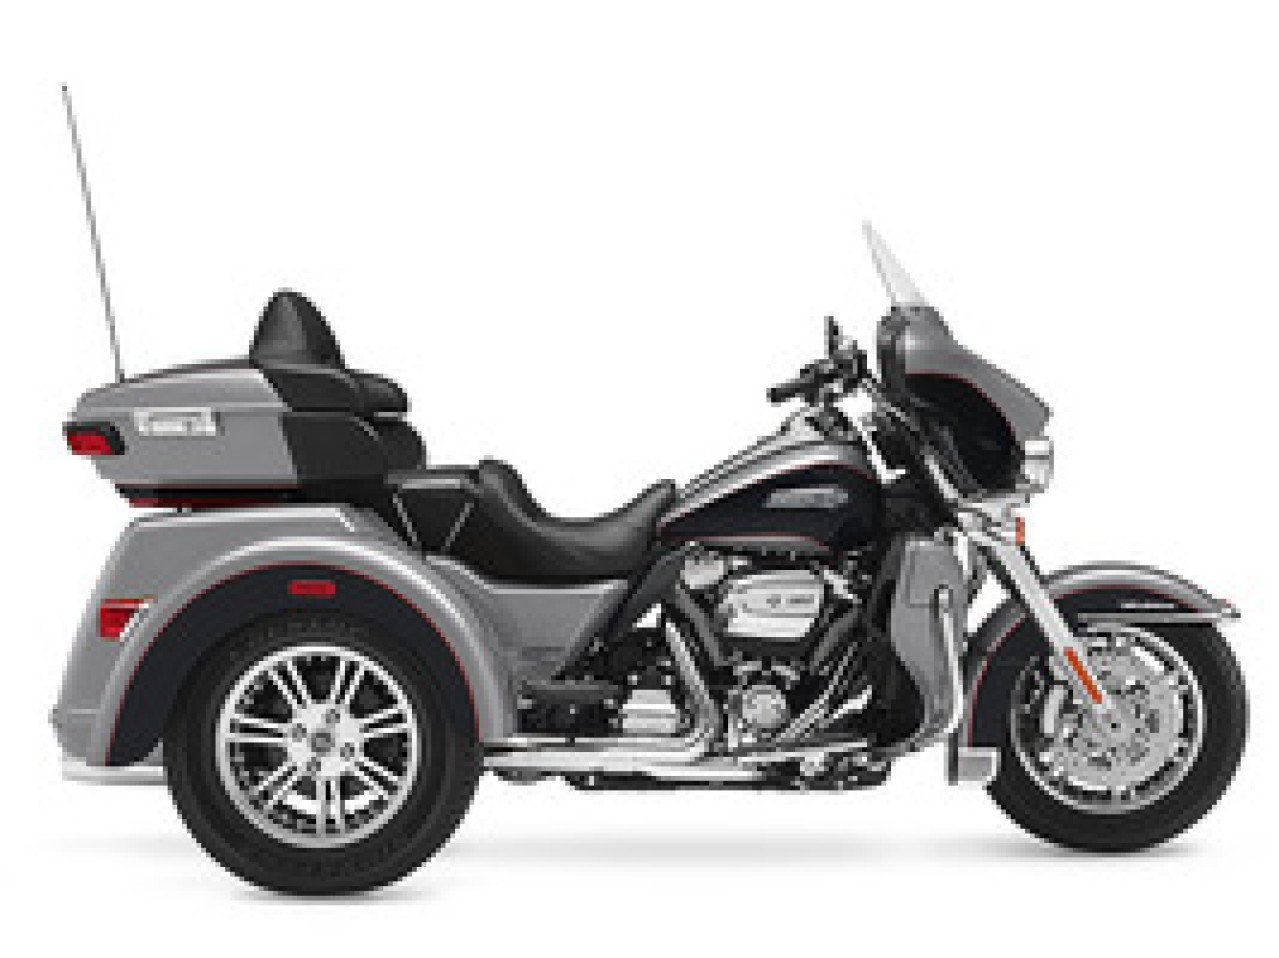 2017 Harley-Davidson Trike for sale near Waukon, Iowa ...